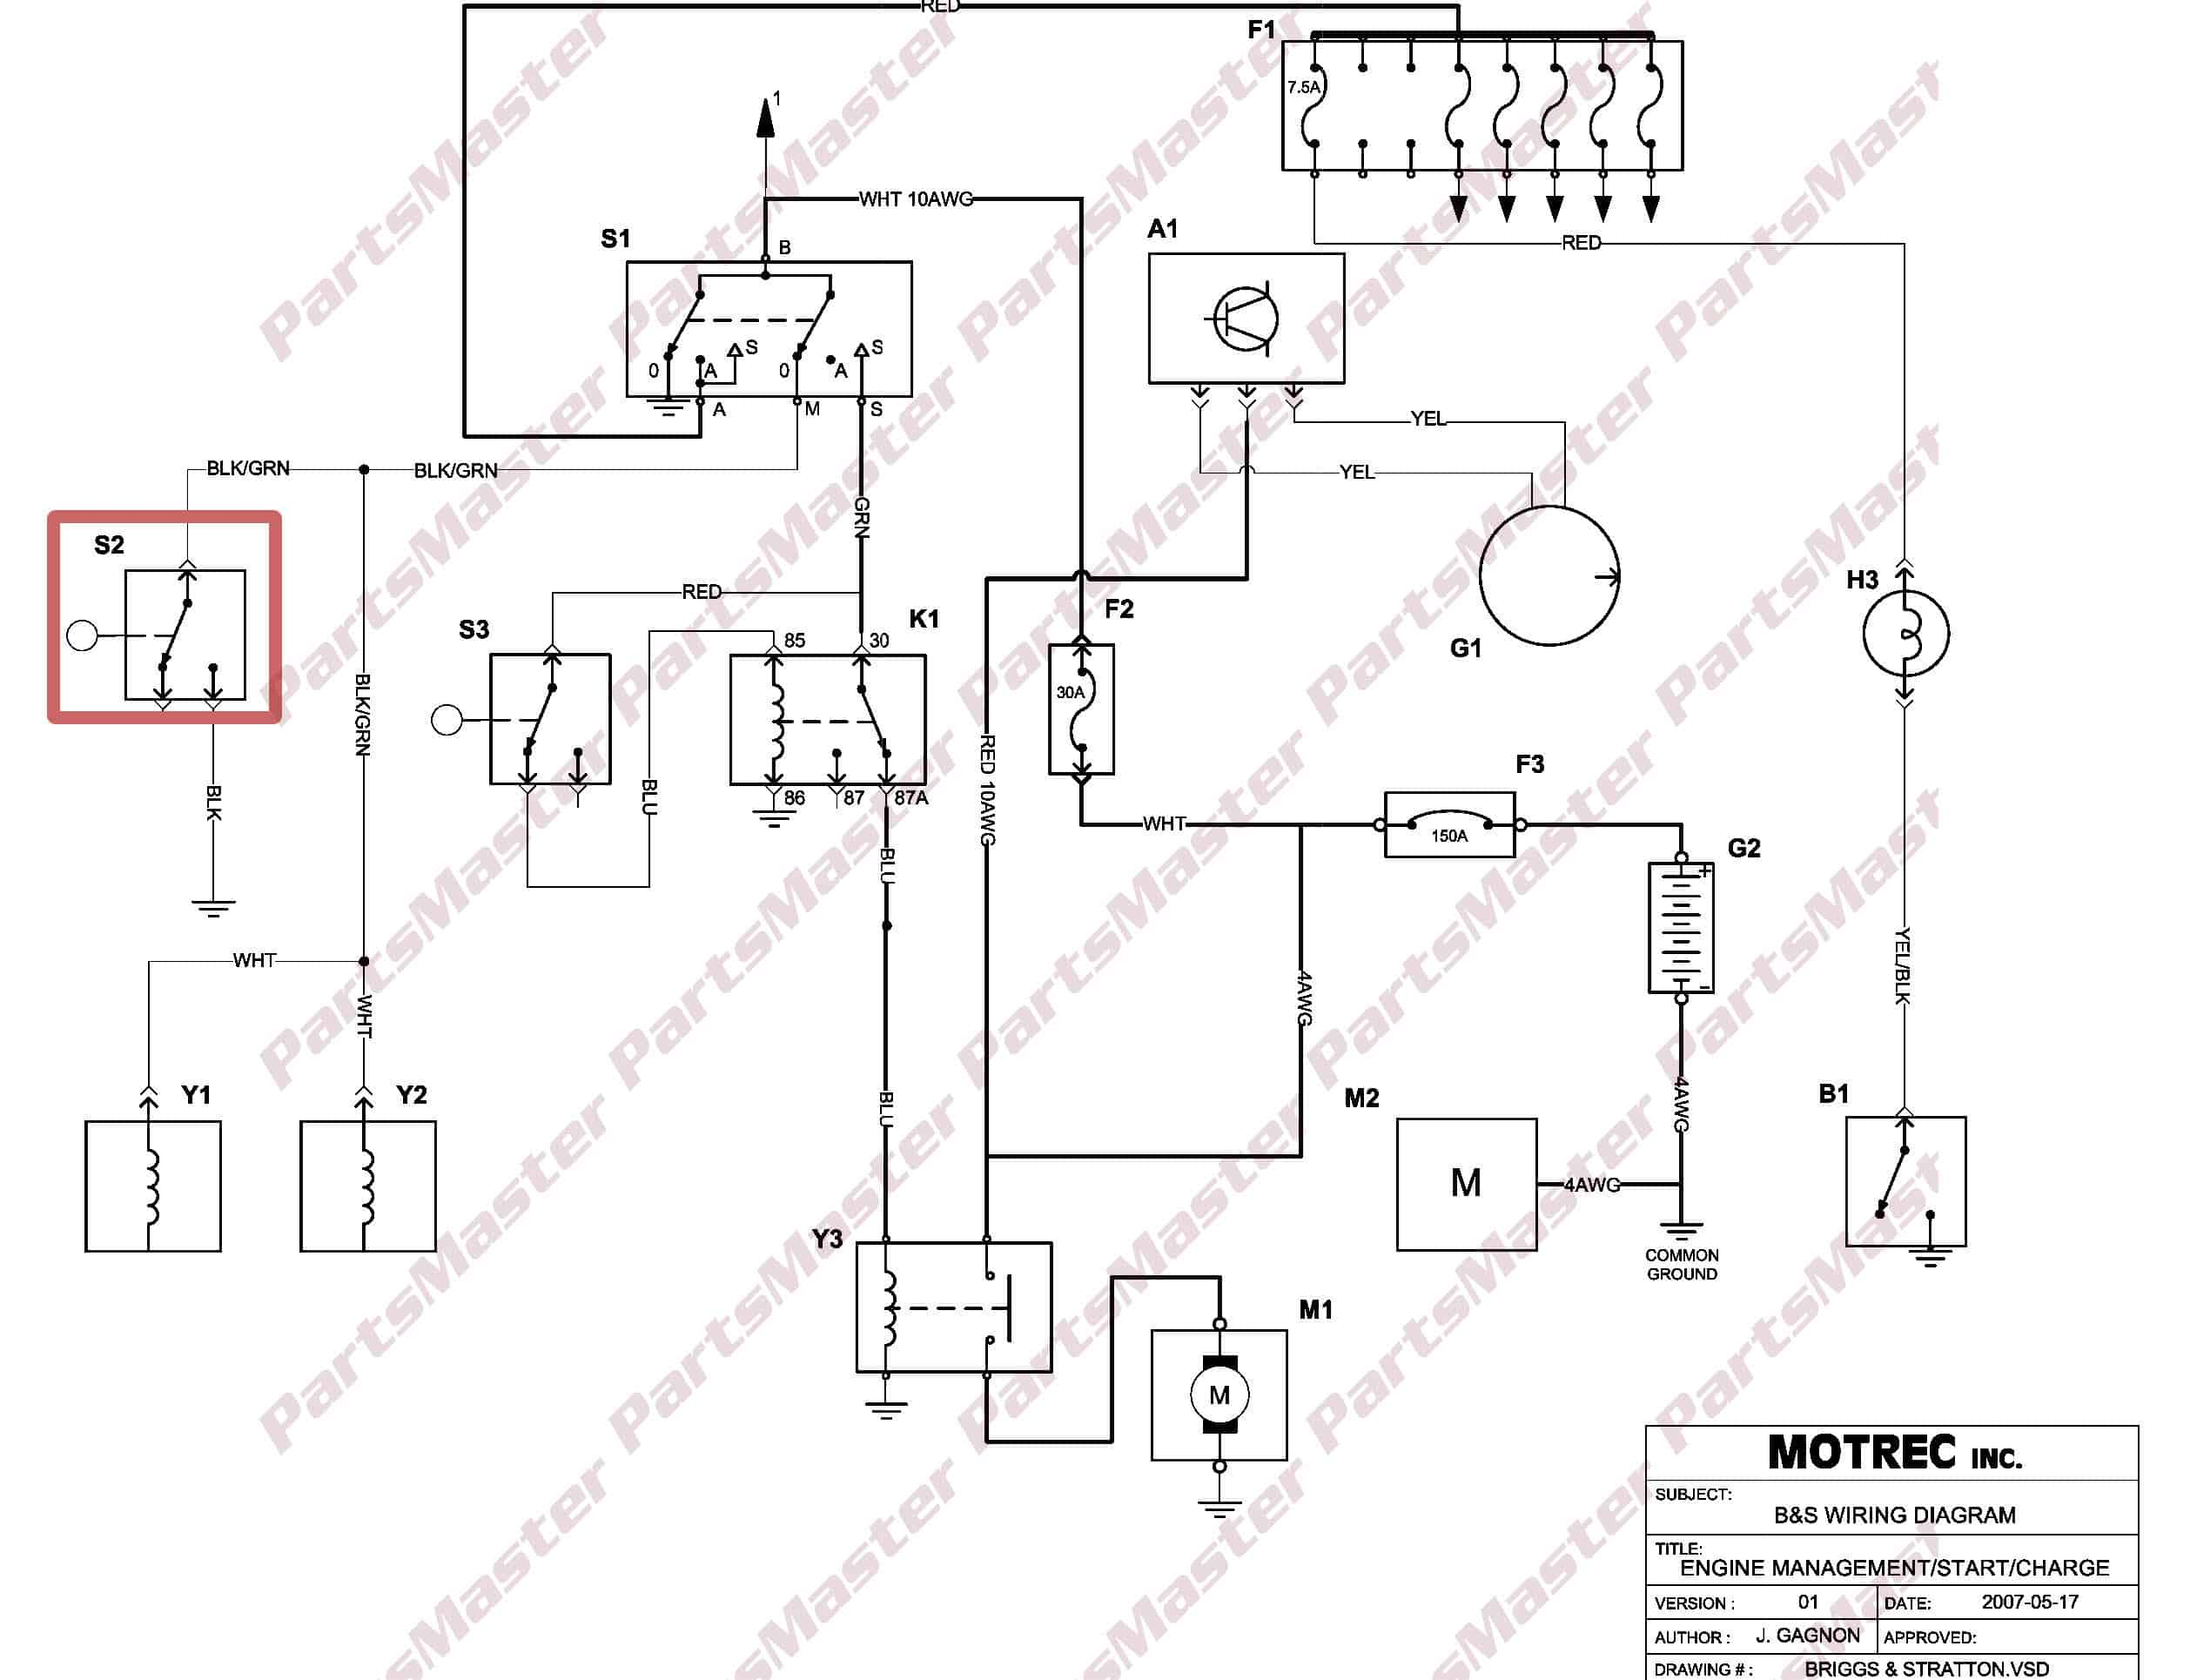 taylor dunn motor wiring free download wiring diagram schematic rh regal wealth co